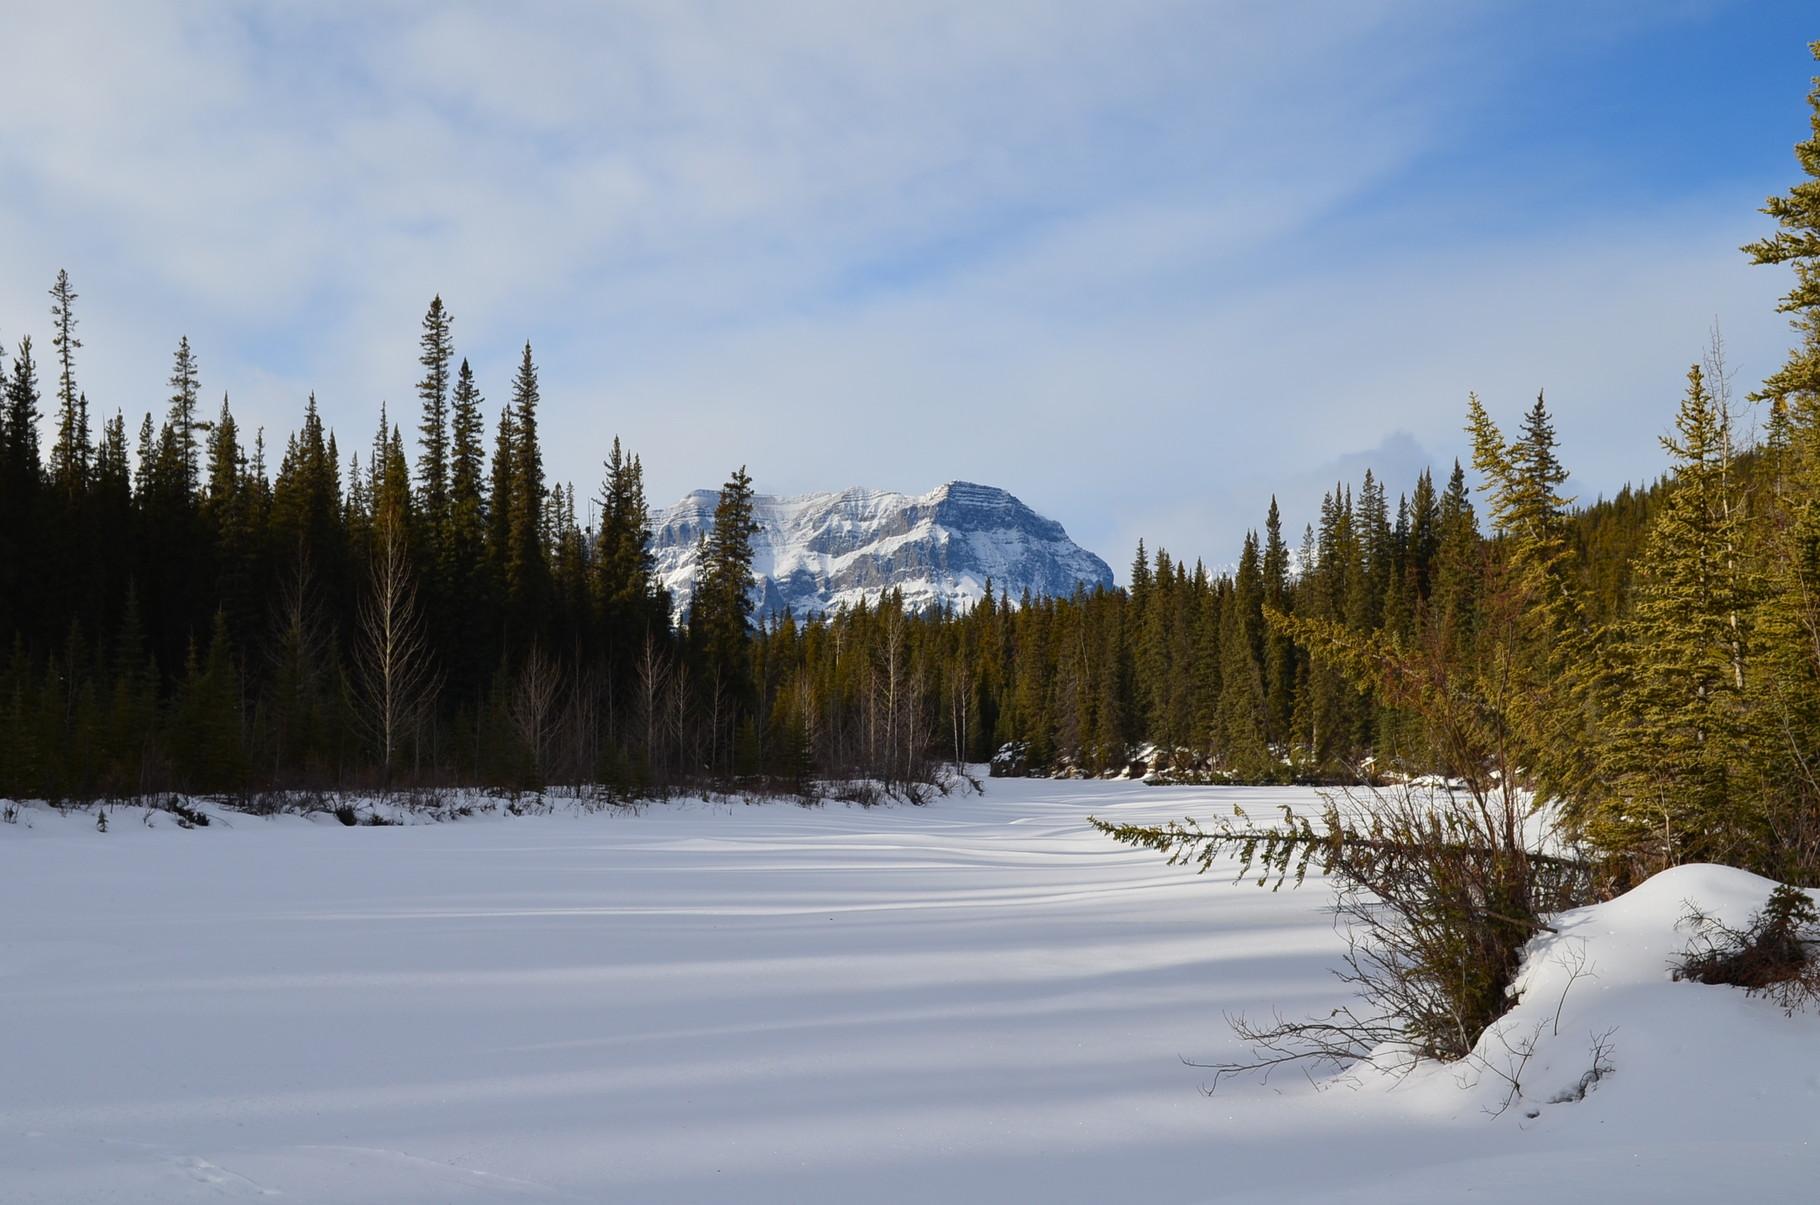 zugefrorener Fluss